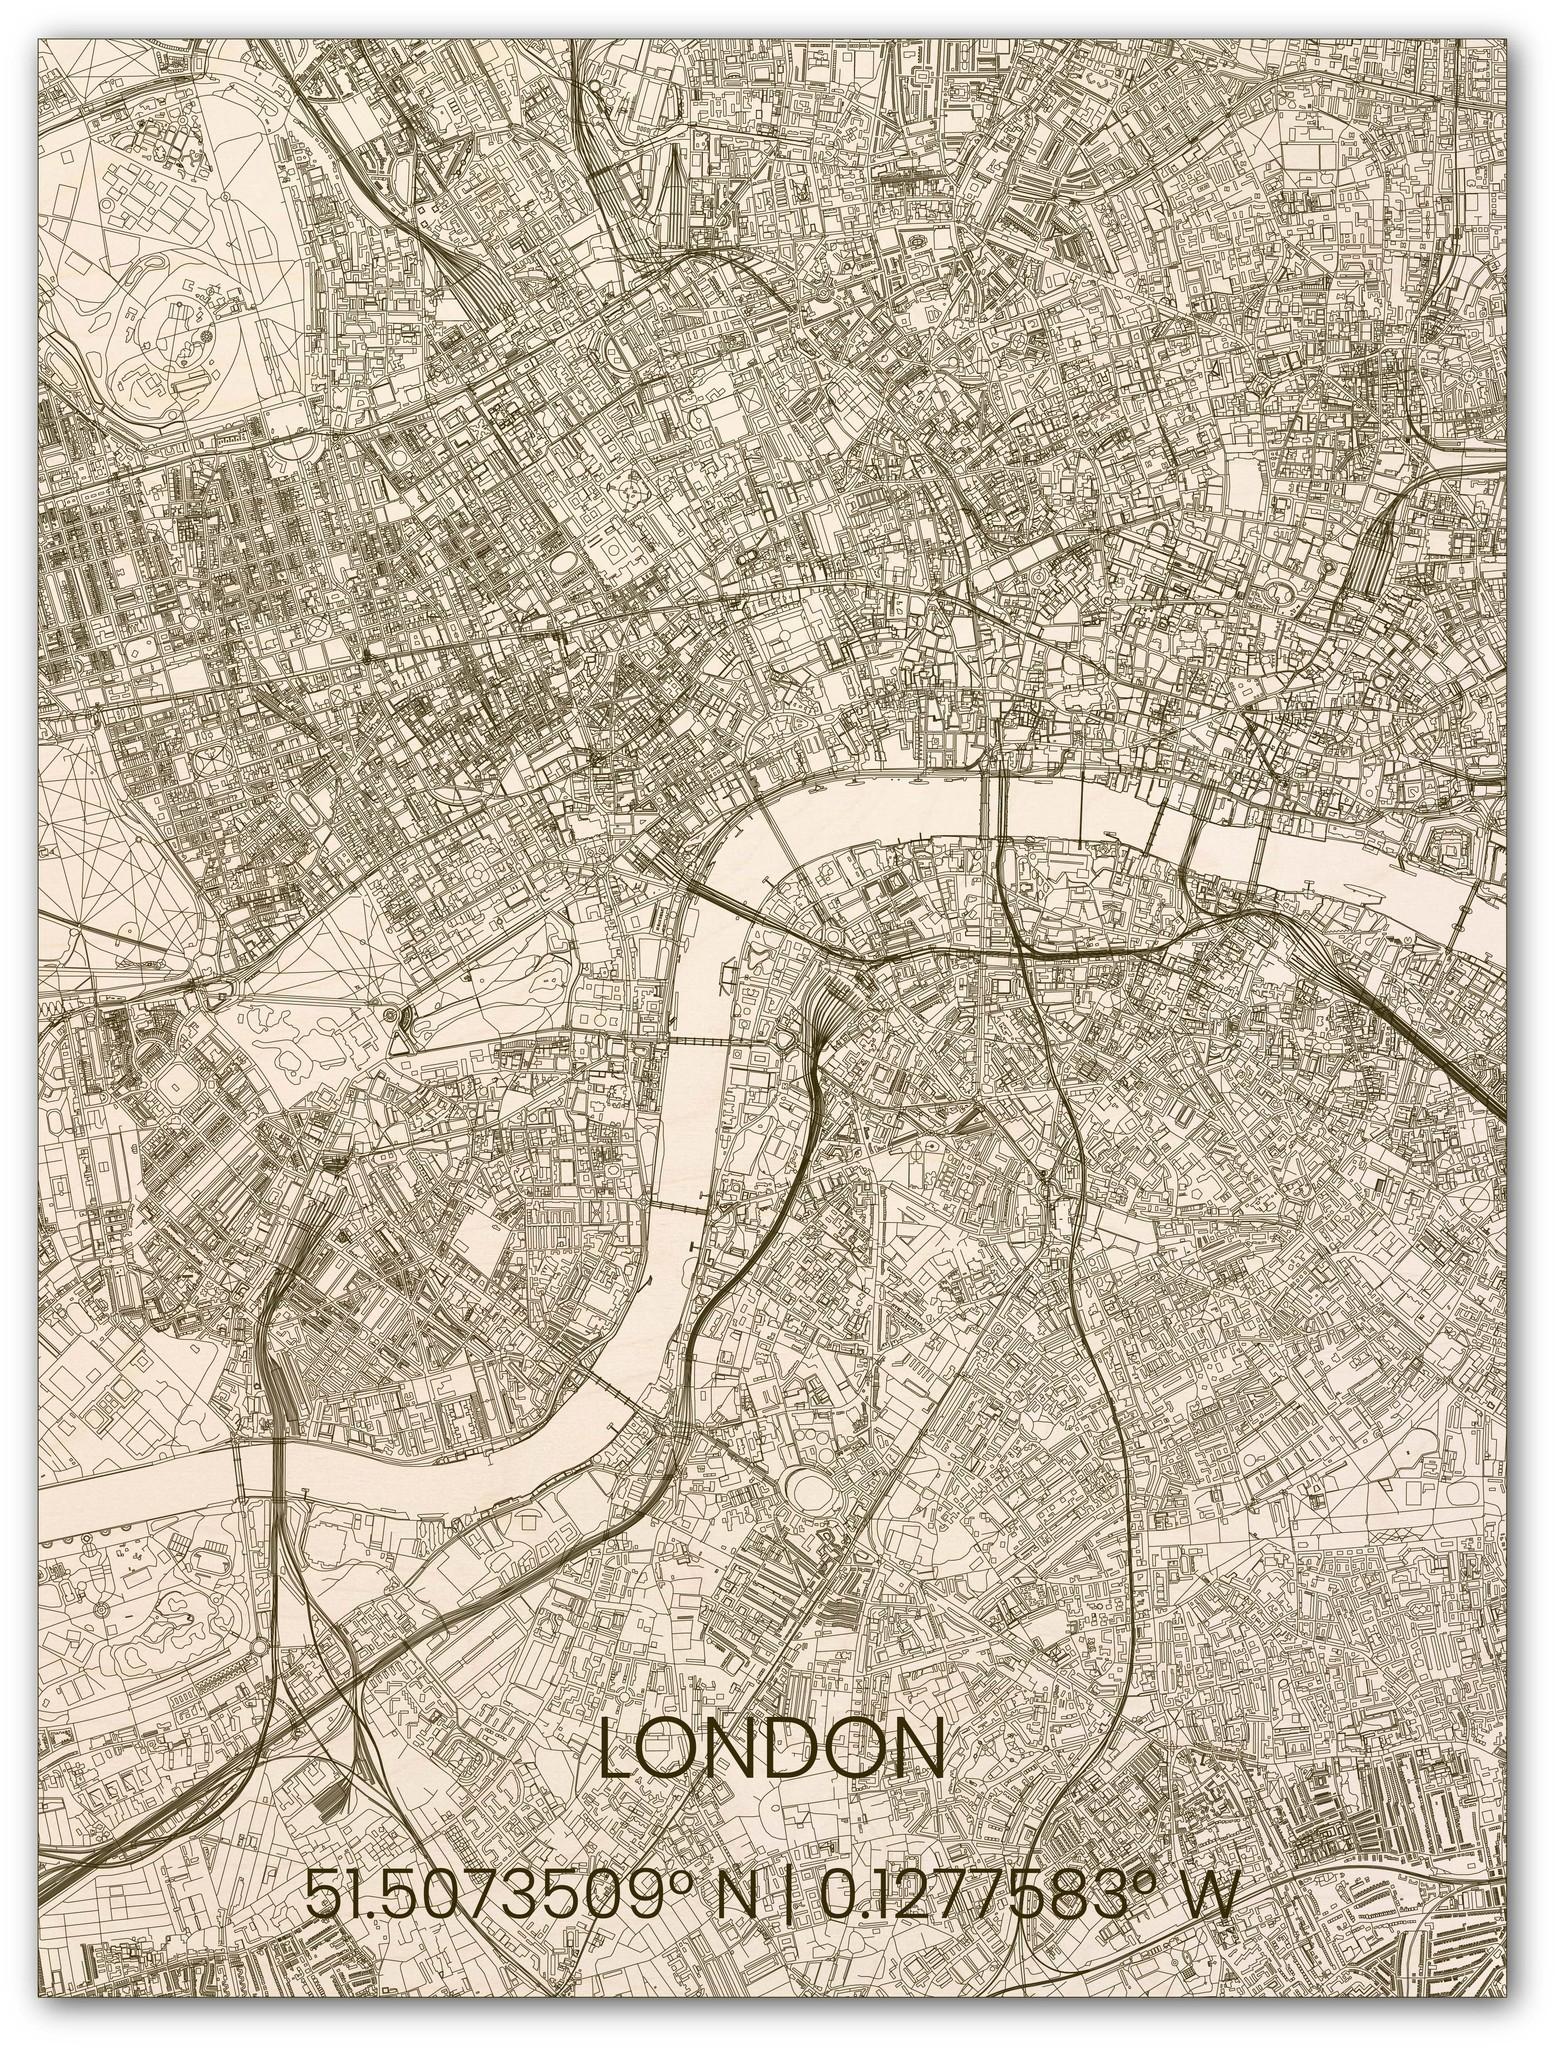 Houten stadsplattegrond Londen-1